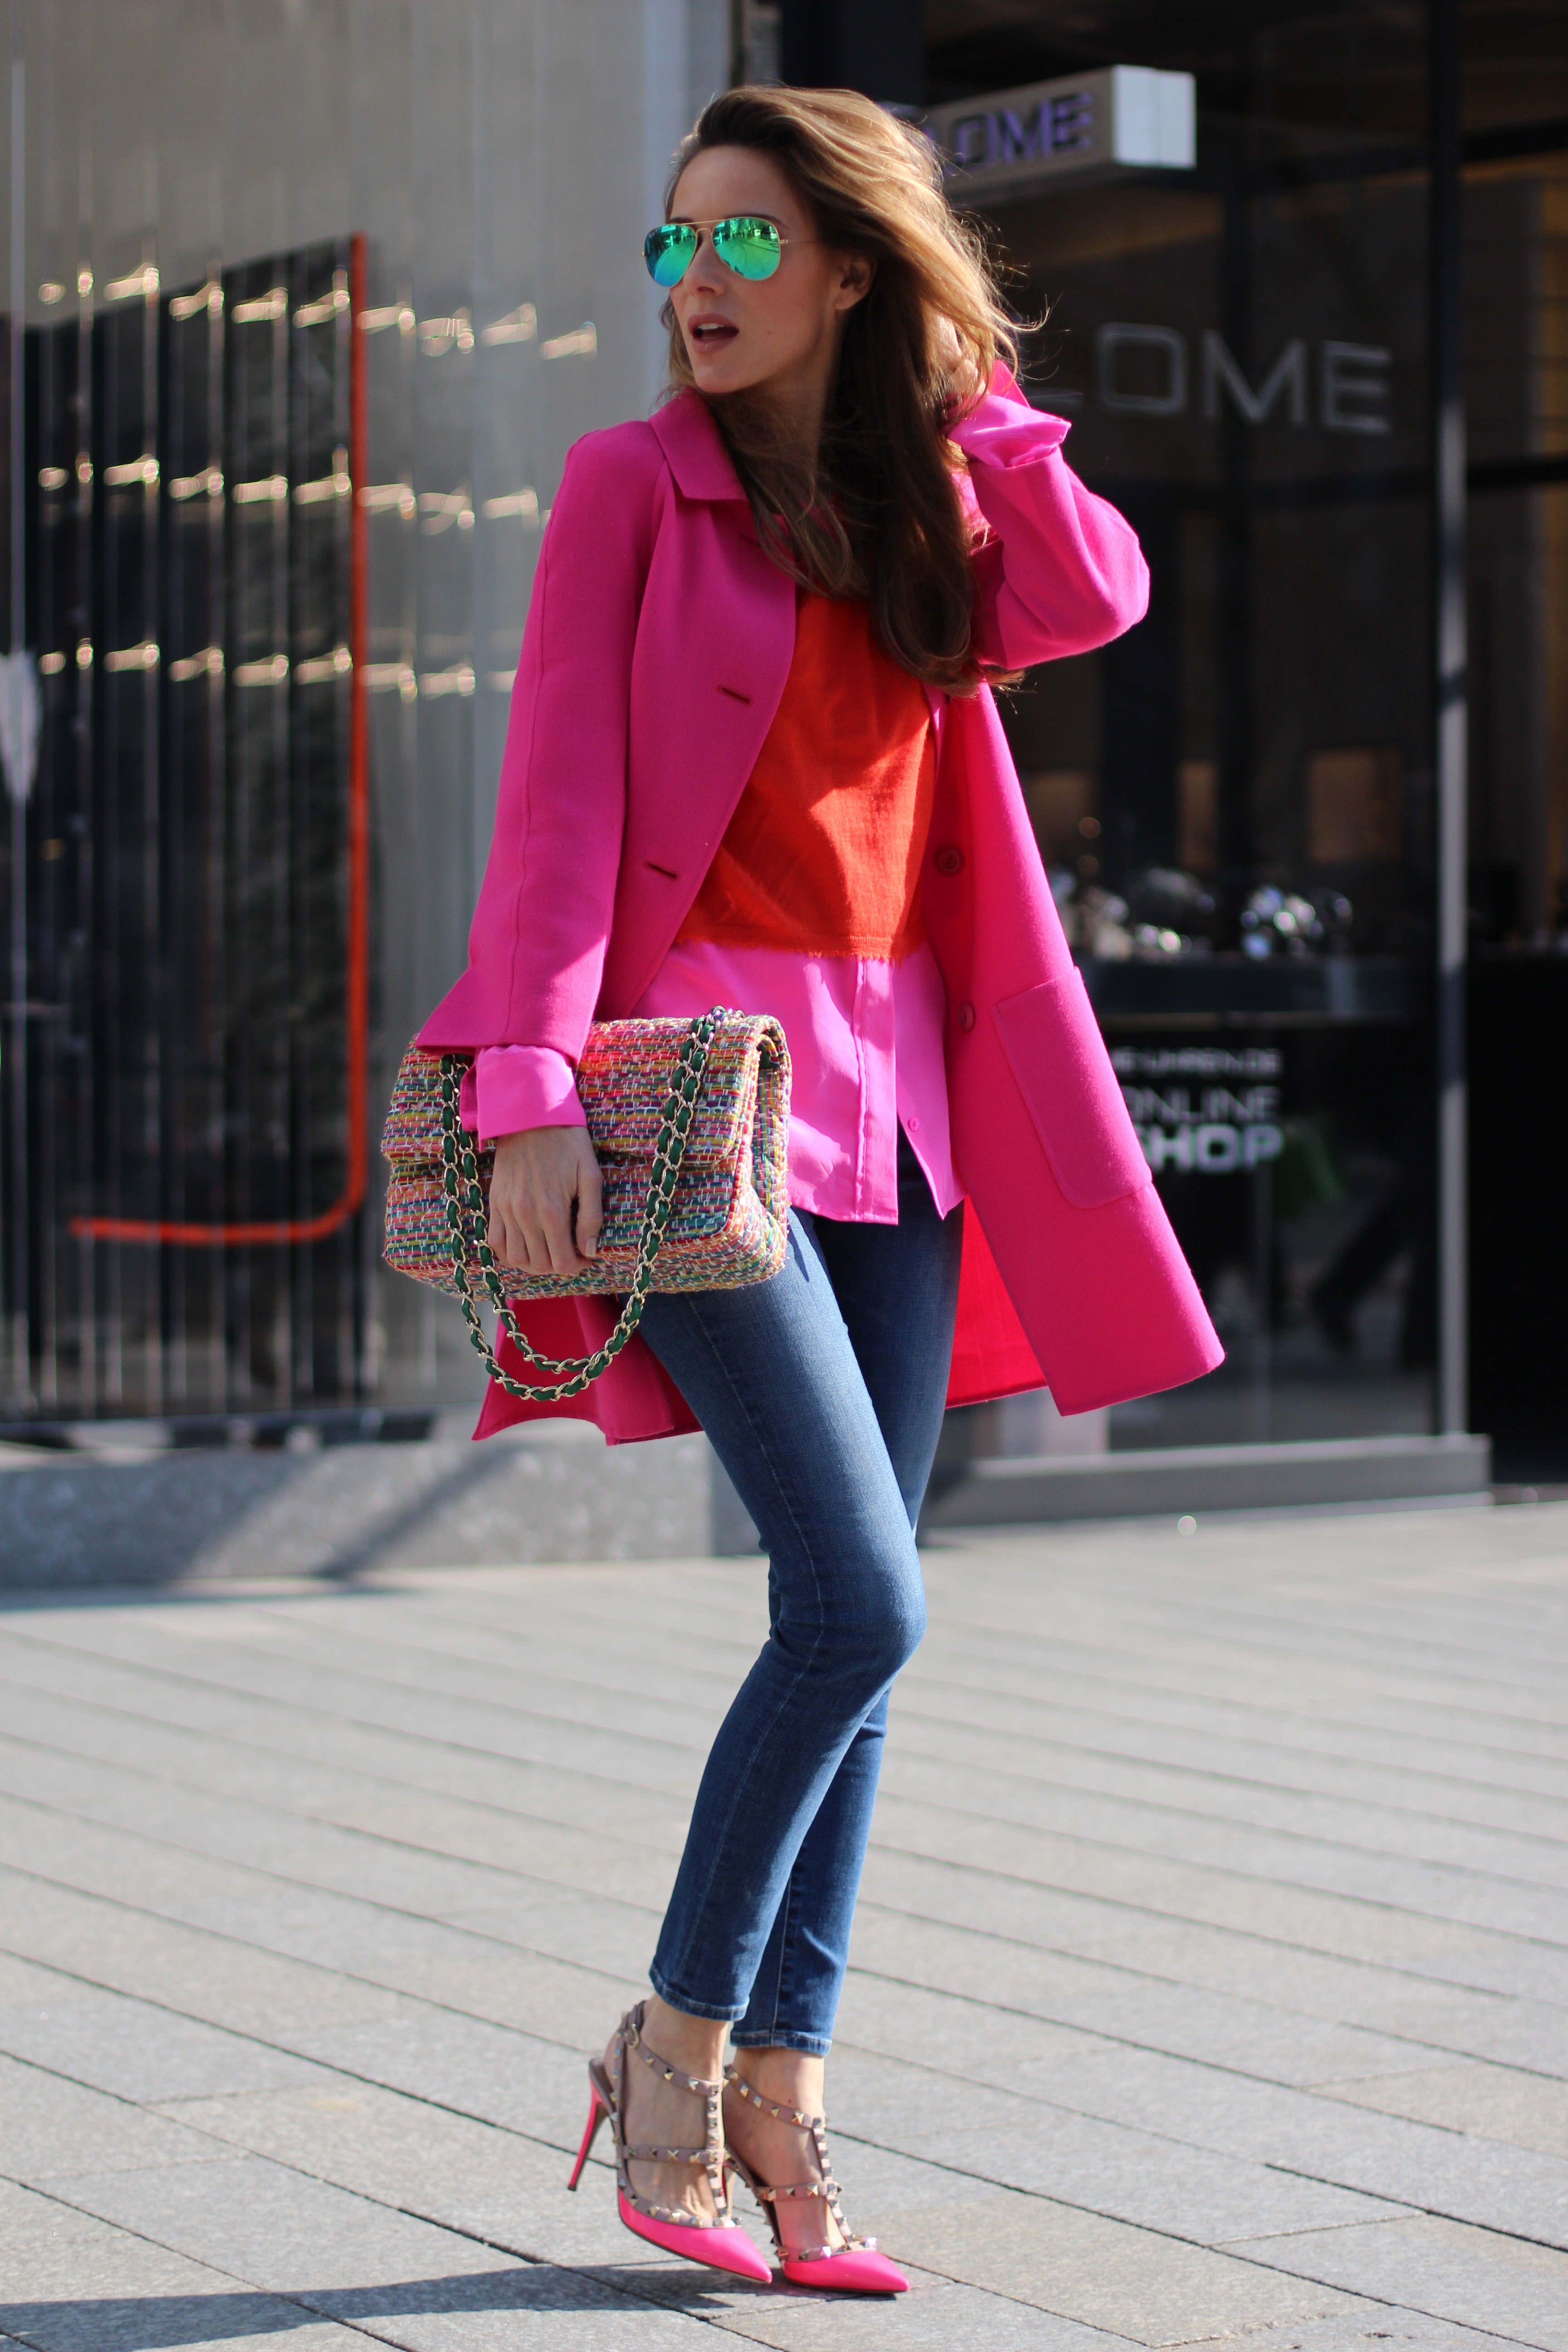 ... Alexandra Lapp wearing Prada, Chanel, AG Jeans, Equipment, Parentis, Valentino, ...